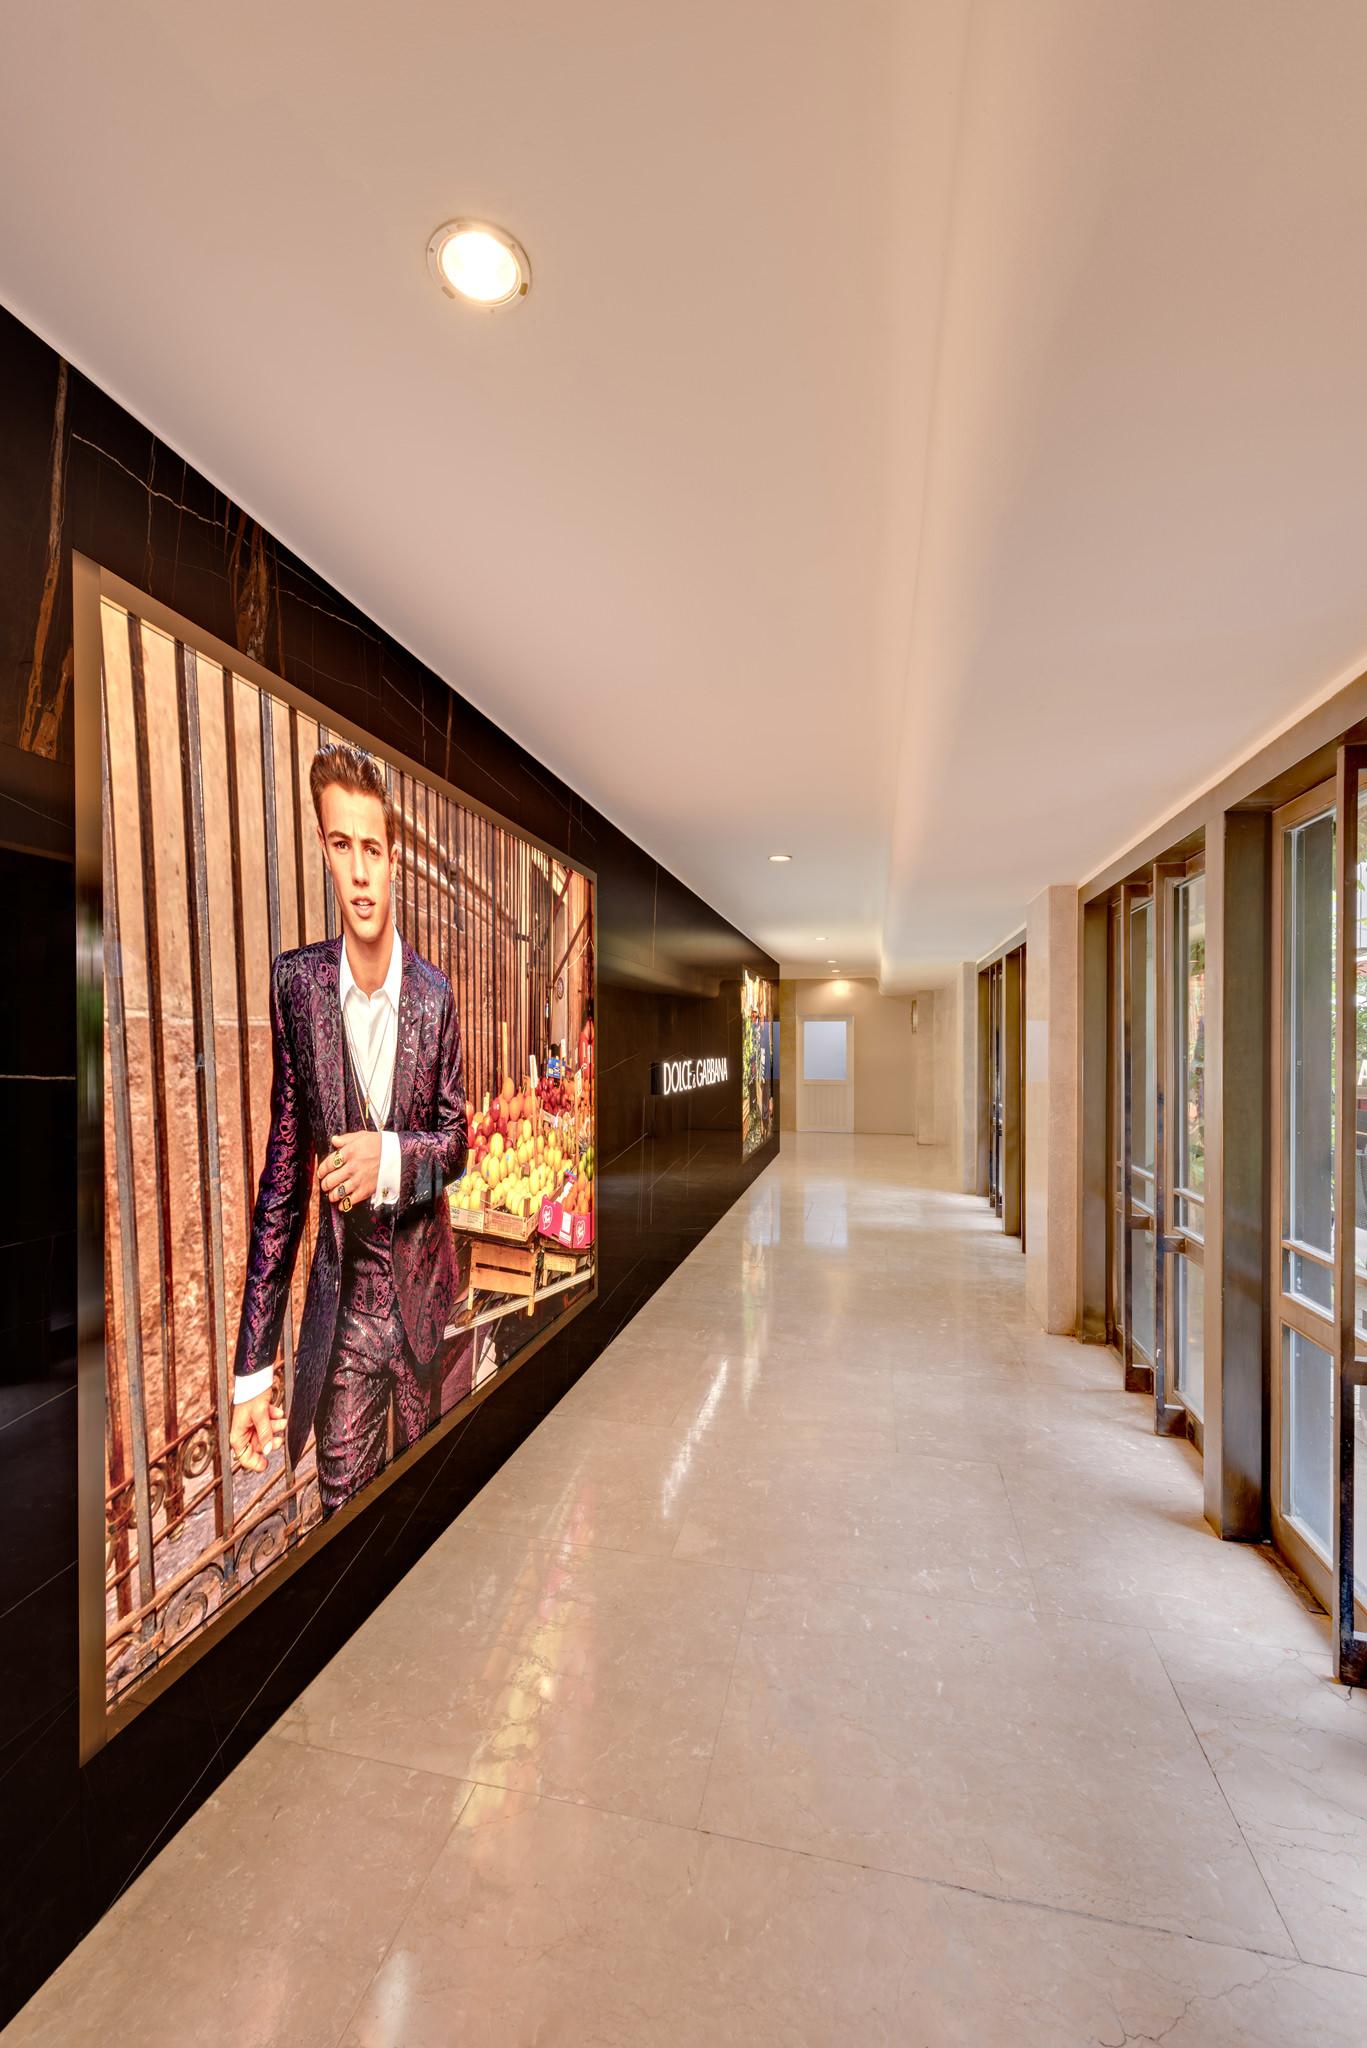 20171011 - Dolce & Gabbana - HCM - Commercial - Interior - Store - Retouch 0271.jpg